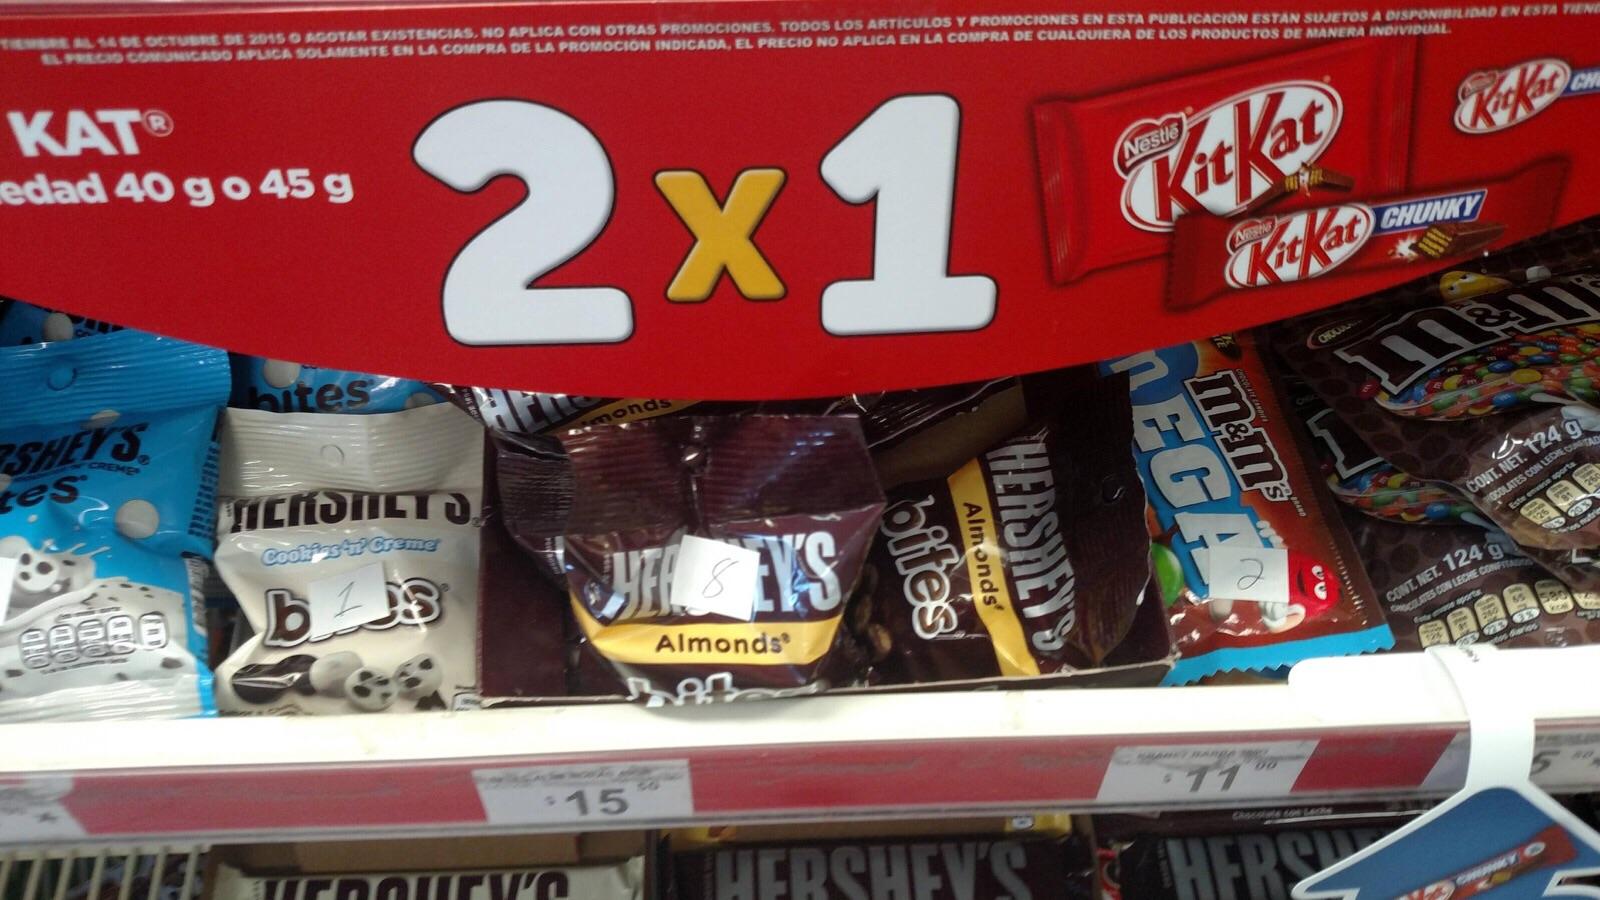 Oxxo: 2x1 en chocolate Kit Kat